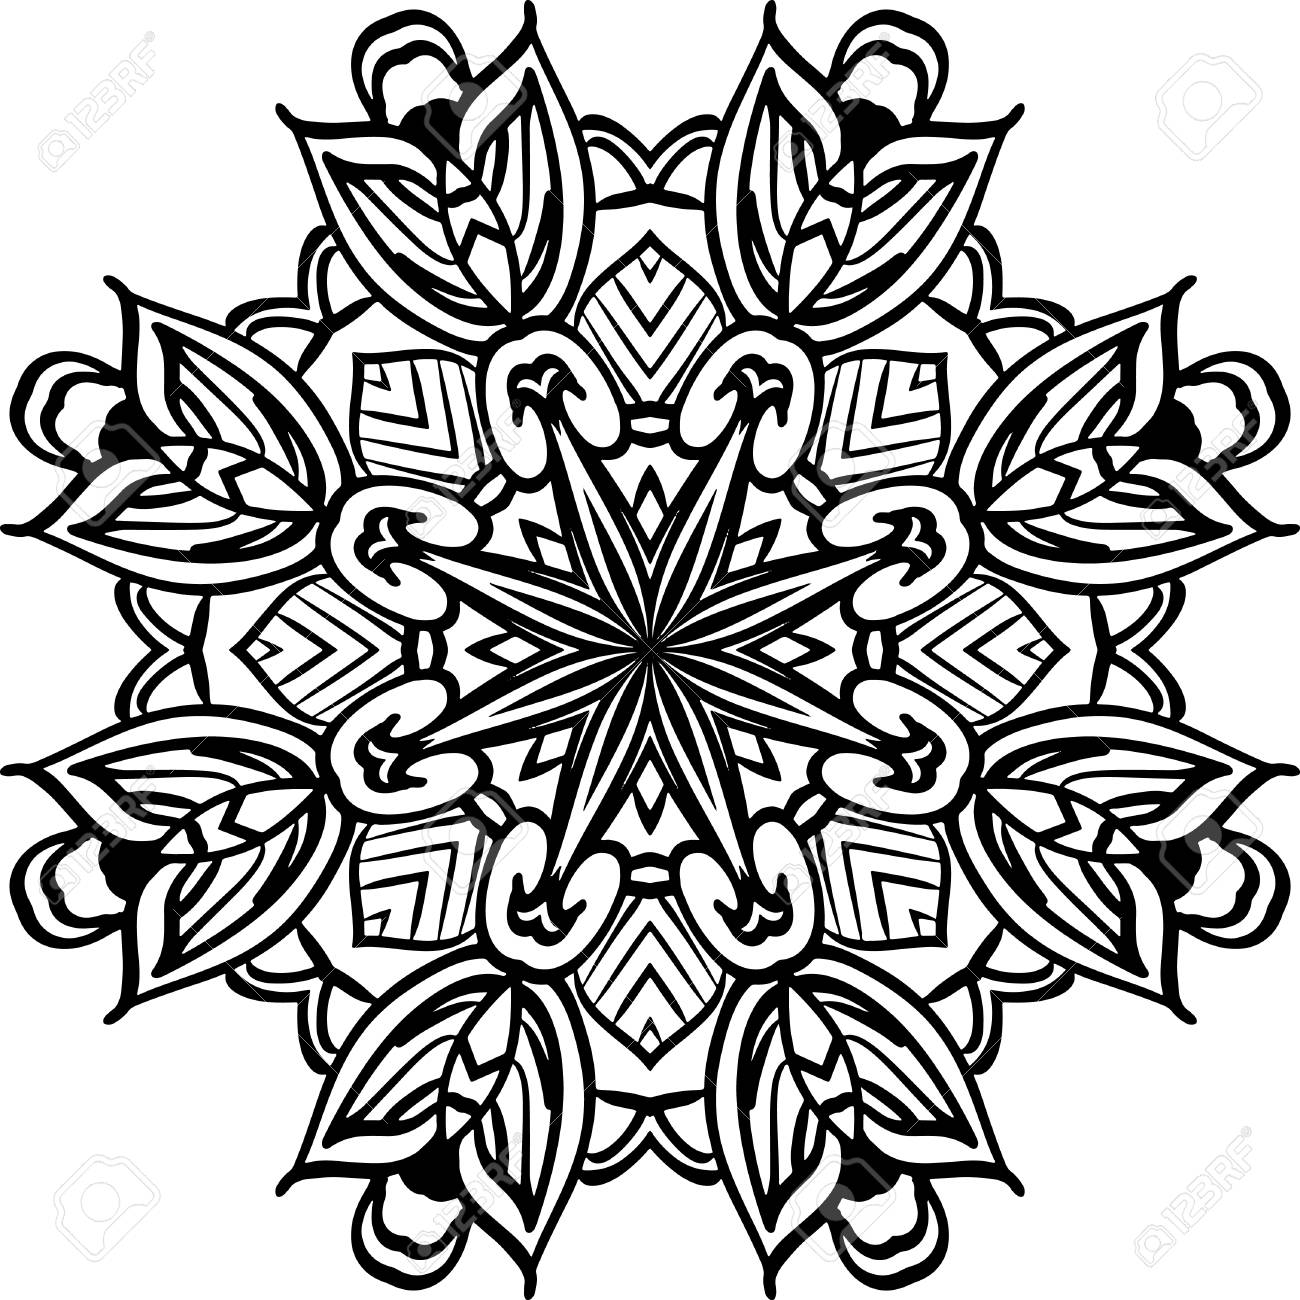 Mandala illustration for backgrounds, coloring books, pattern..